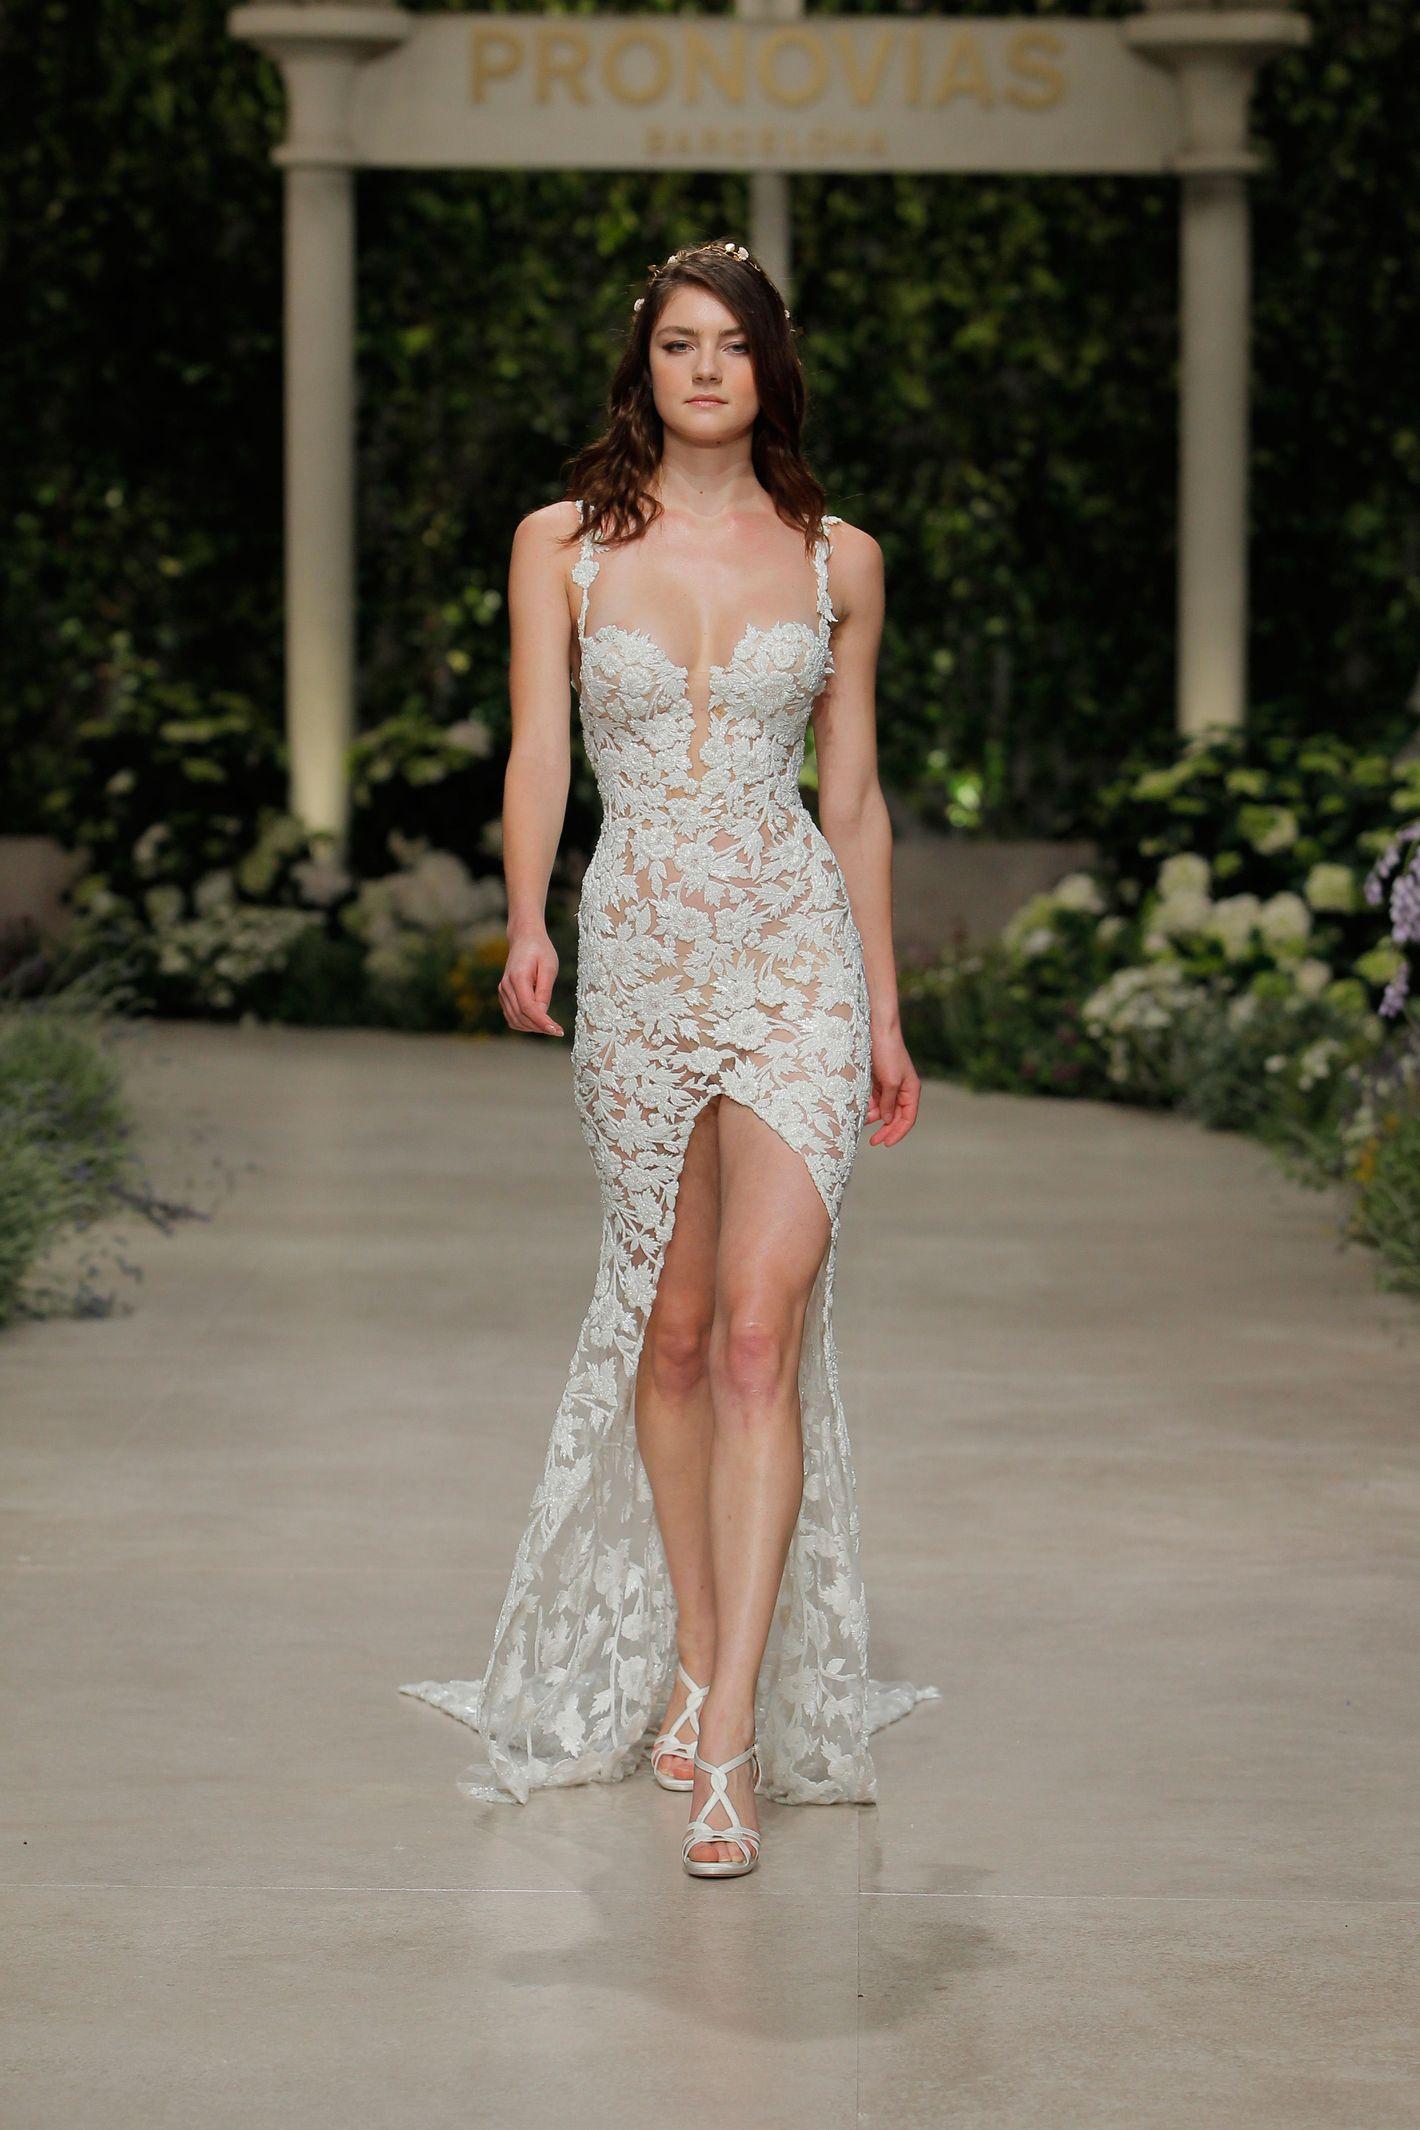 wedding dresses 20 spring off 20   medpharmres.com